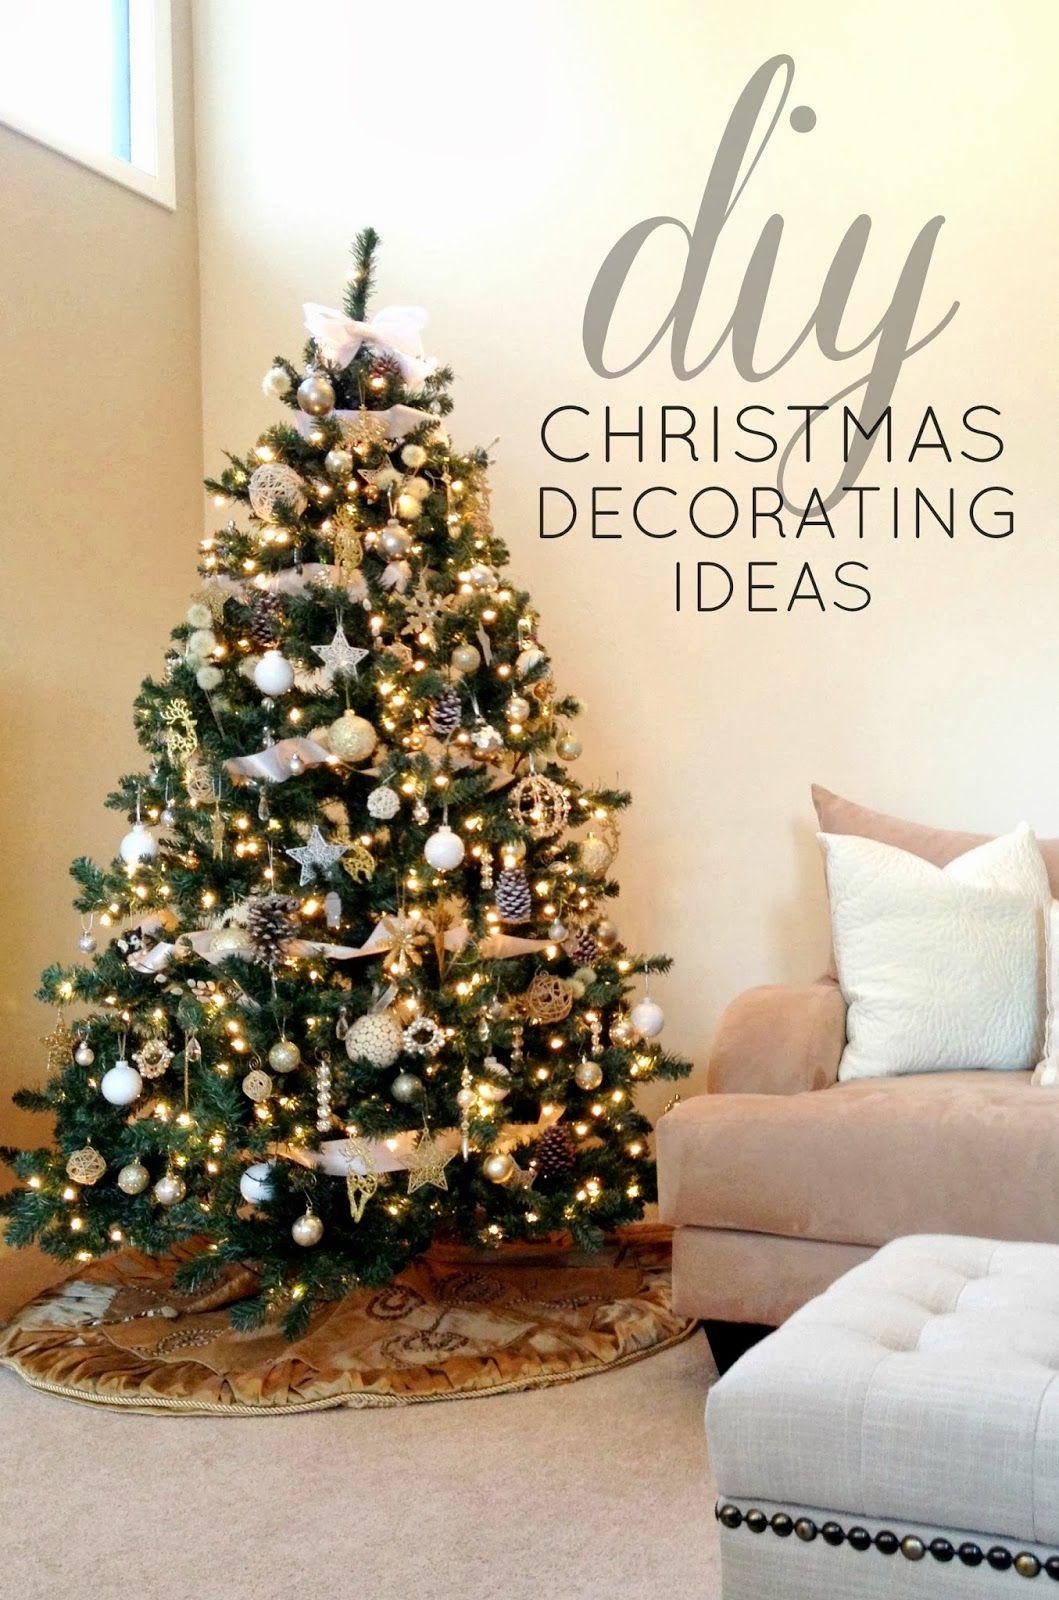 Christmas tree ideas CHRISTMASDECORATINGIDEAS1copyjpg 10591600 trees